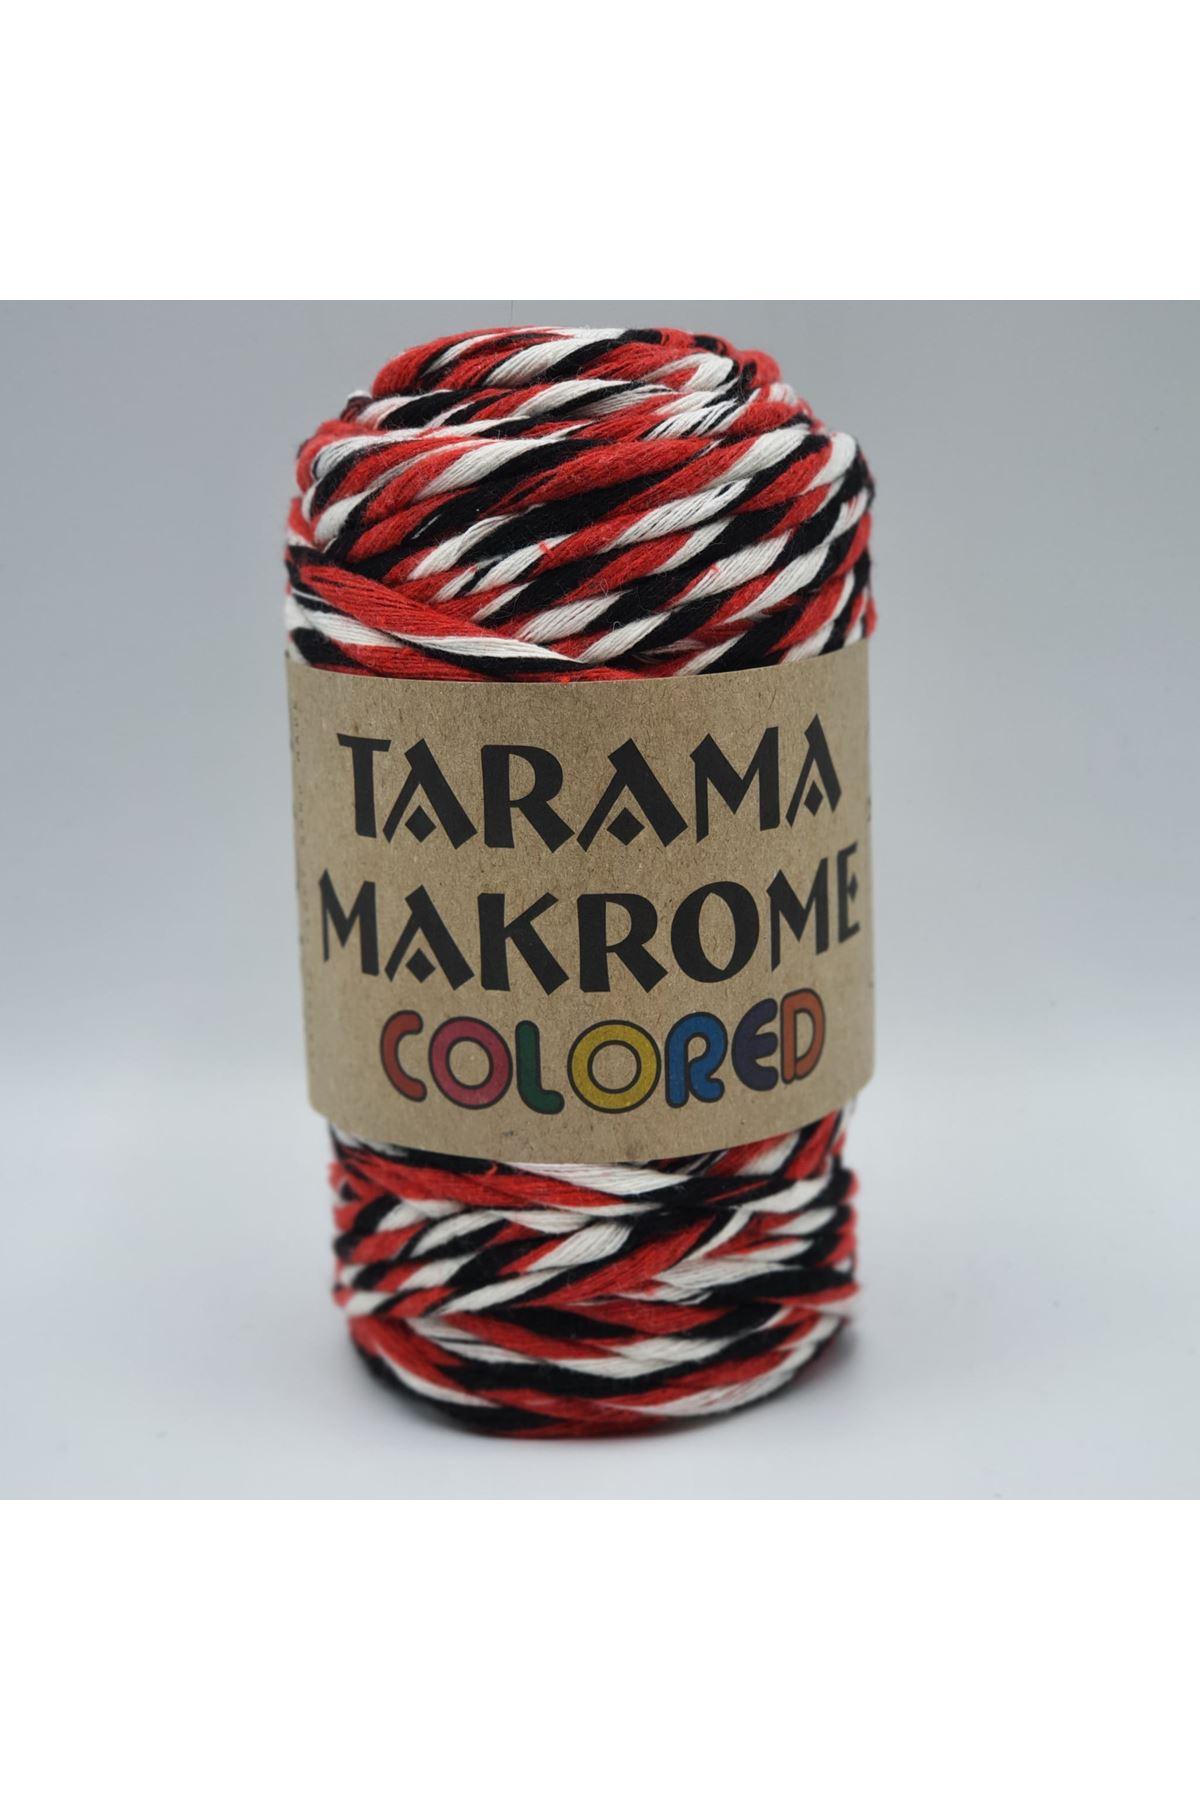 Tarama Makrome Colored 5 mm - 15